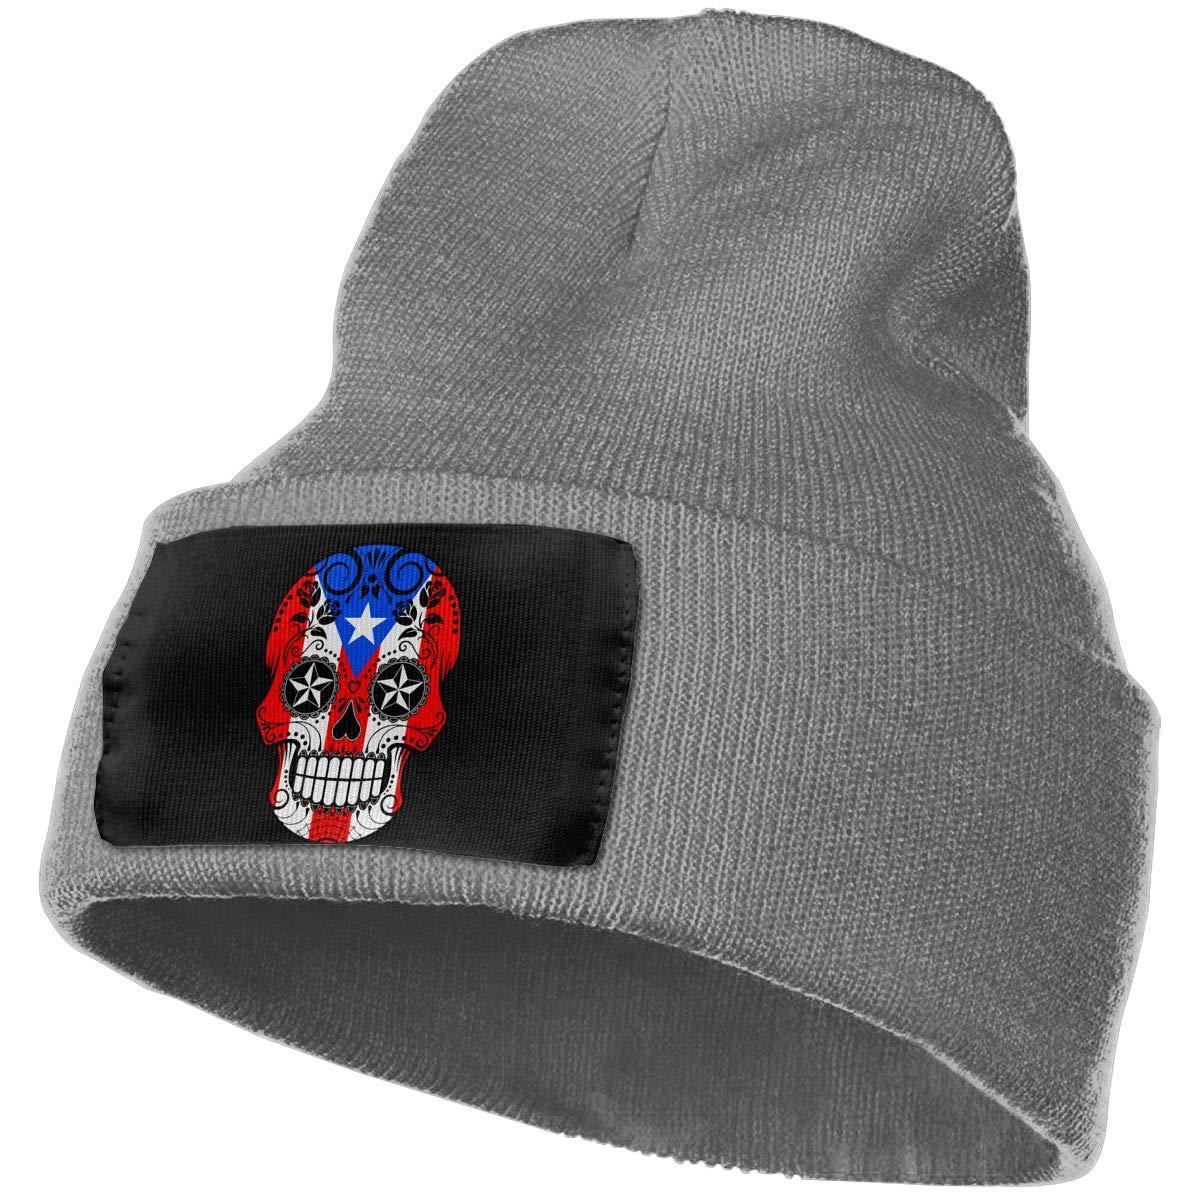 Mens and Womens 100/% Acrylic Knitting Hat Cap Sugar Skull with Roses and Flag of Puerto Rico Original Skull Cap